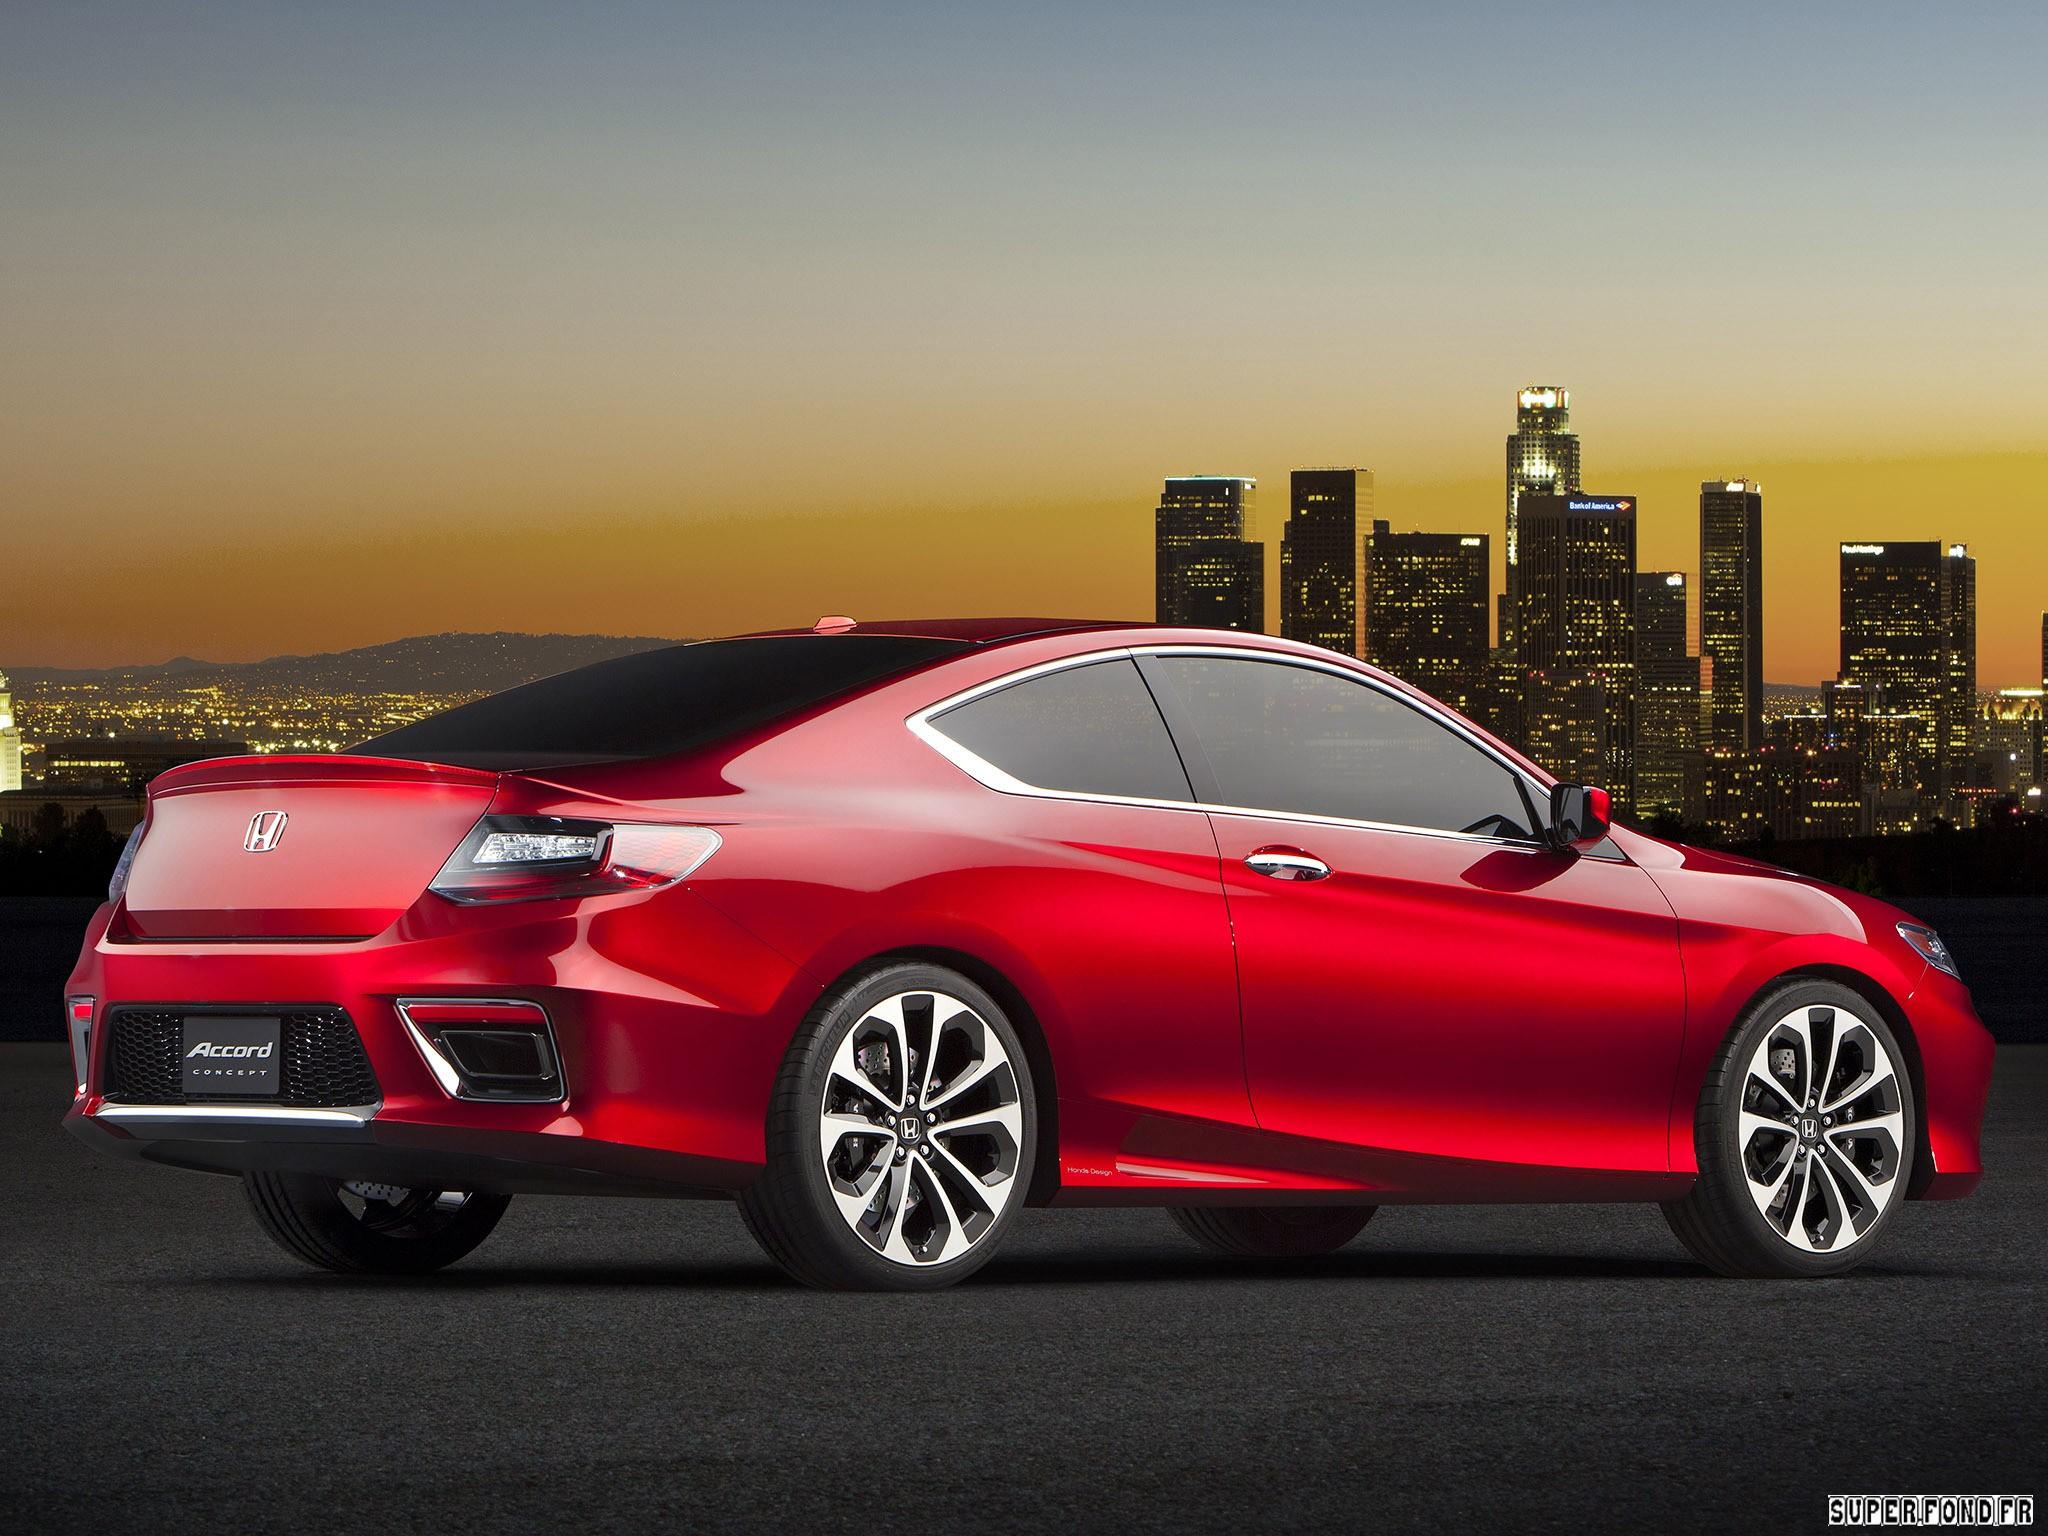 2012 Honda Accord Coupe Concept